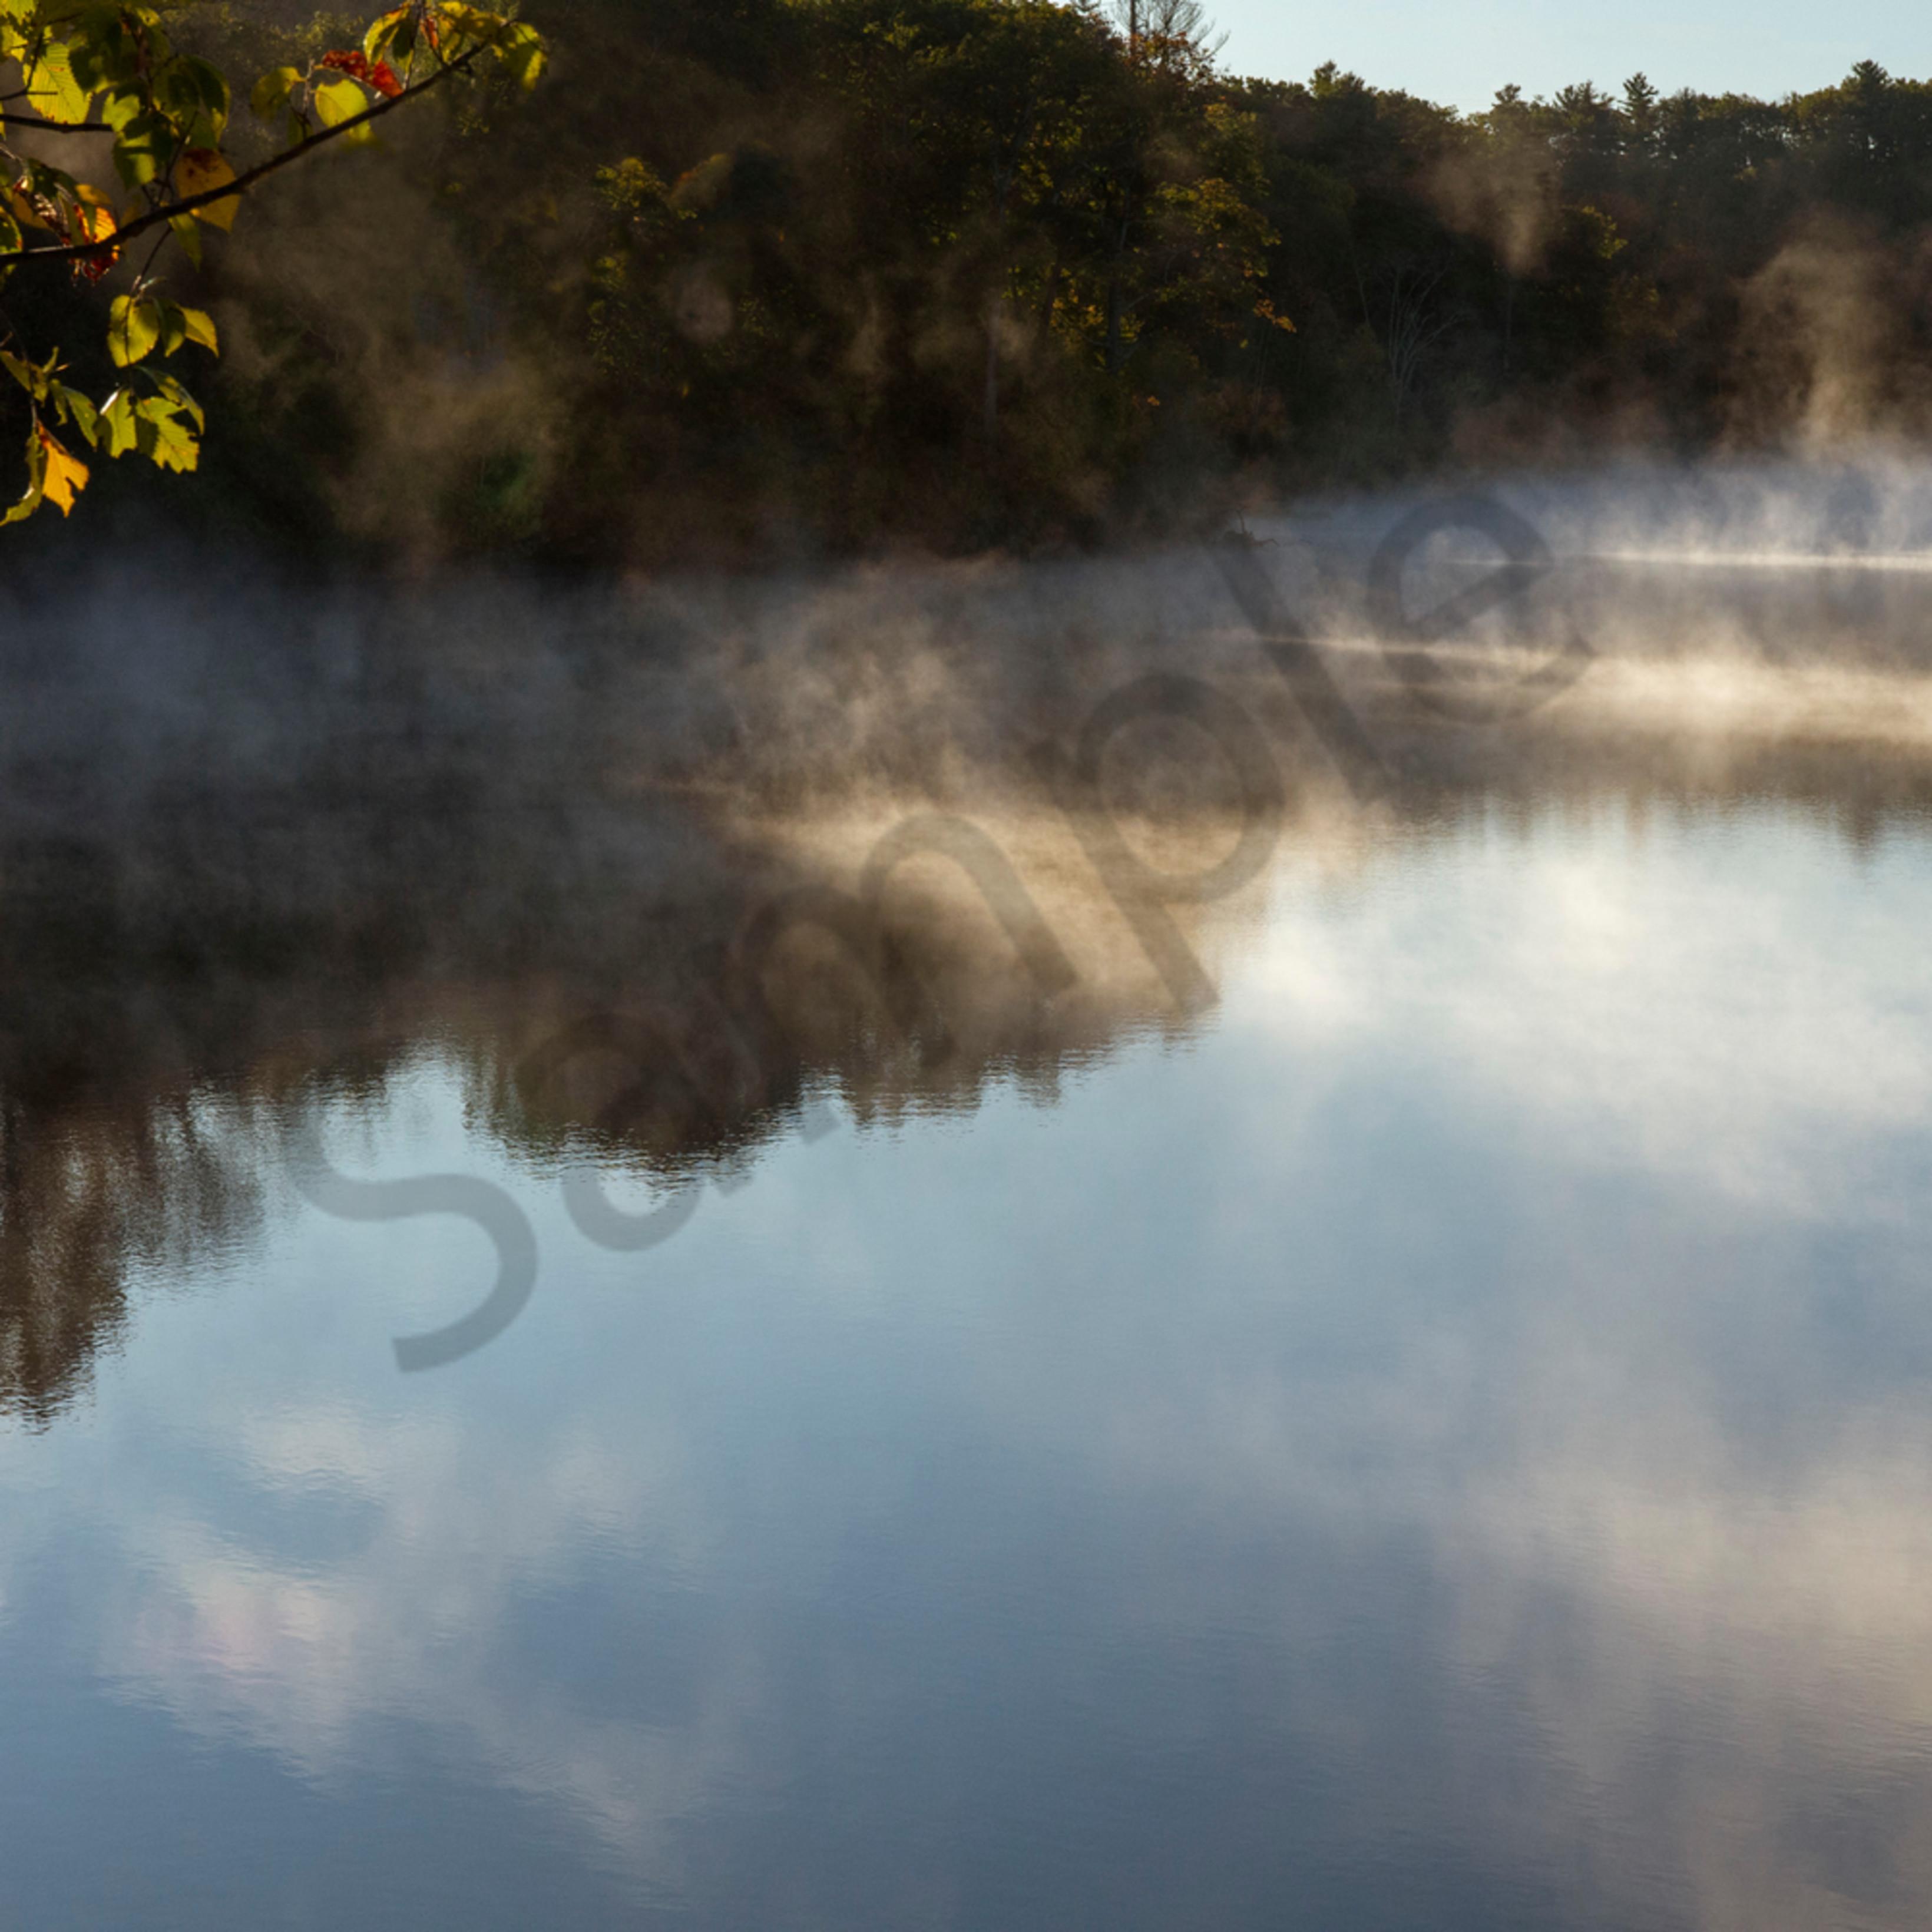 Morning on the pond2bay nak4kq